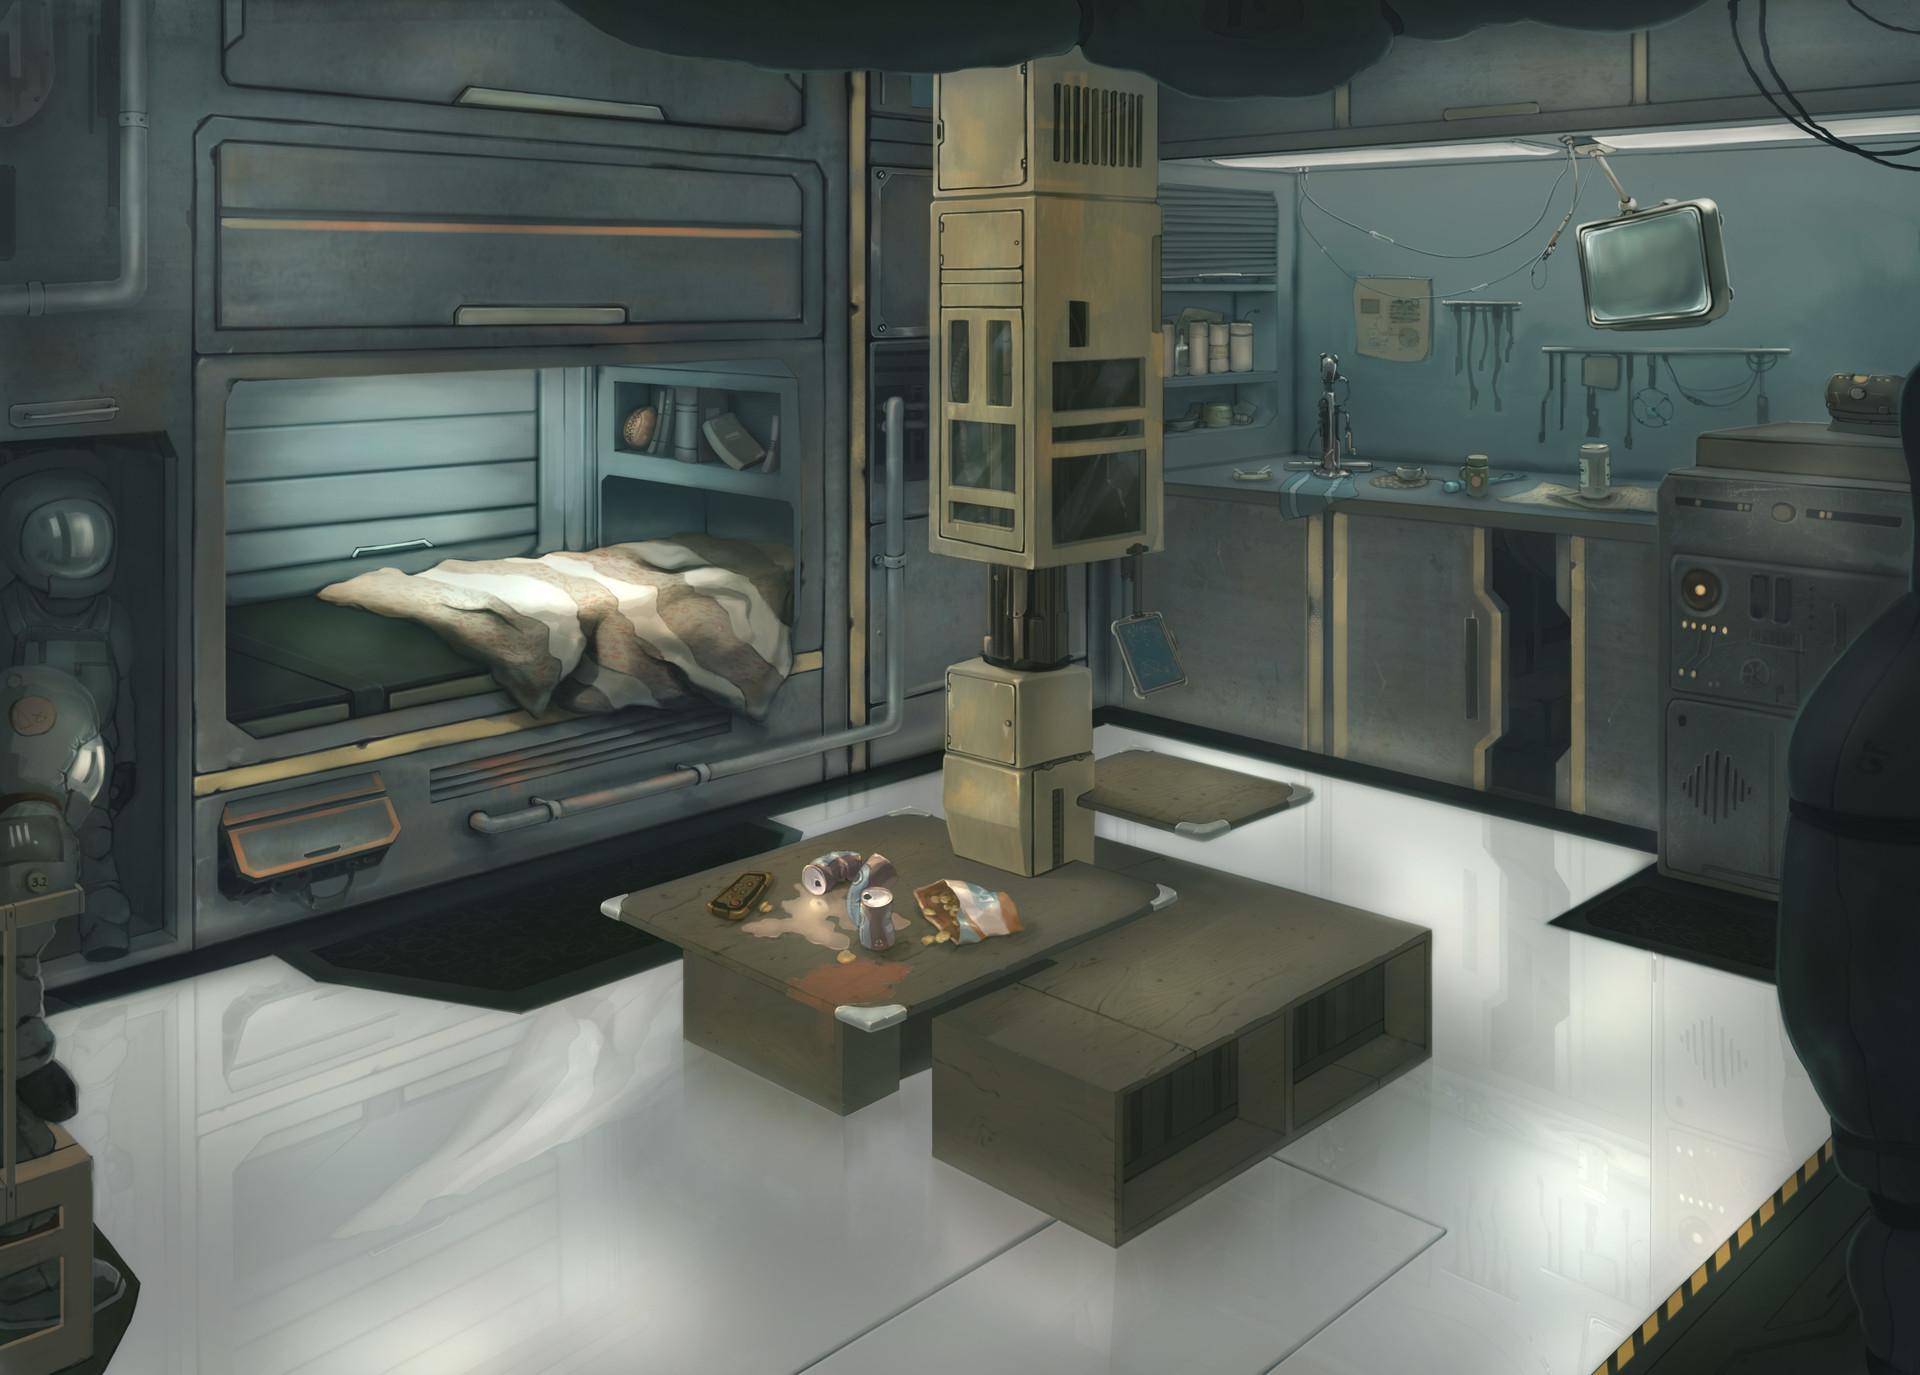 Fladik Gabdrakhimov Spaceship Interior Concept Art